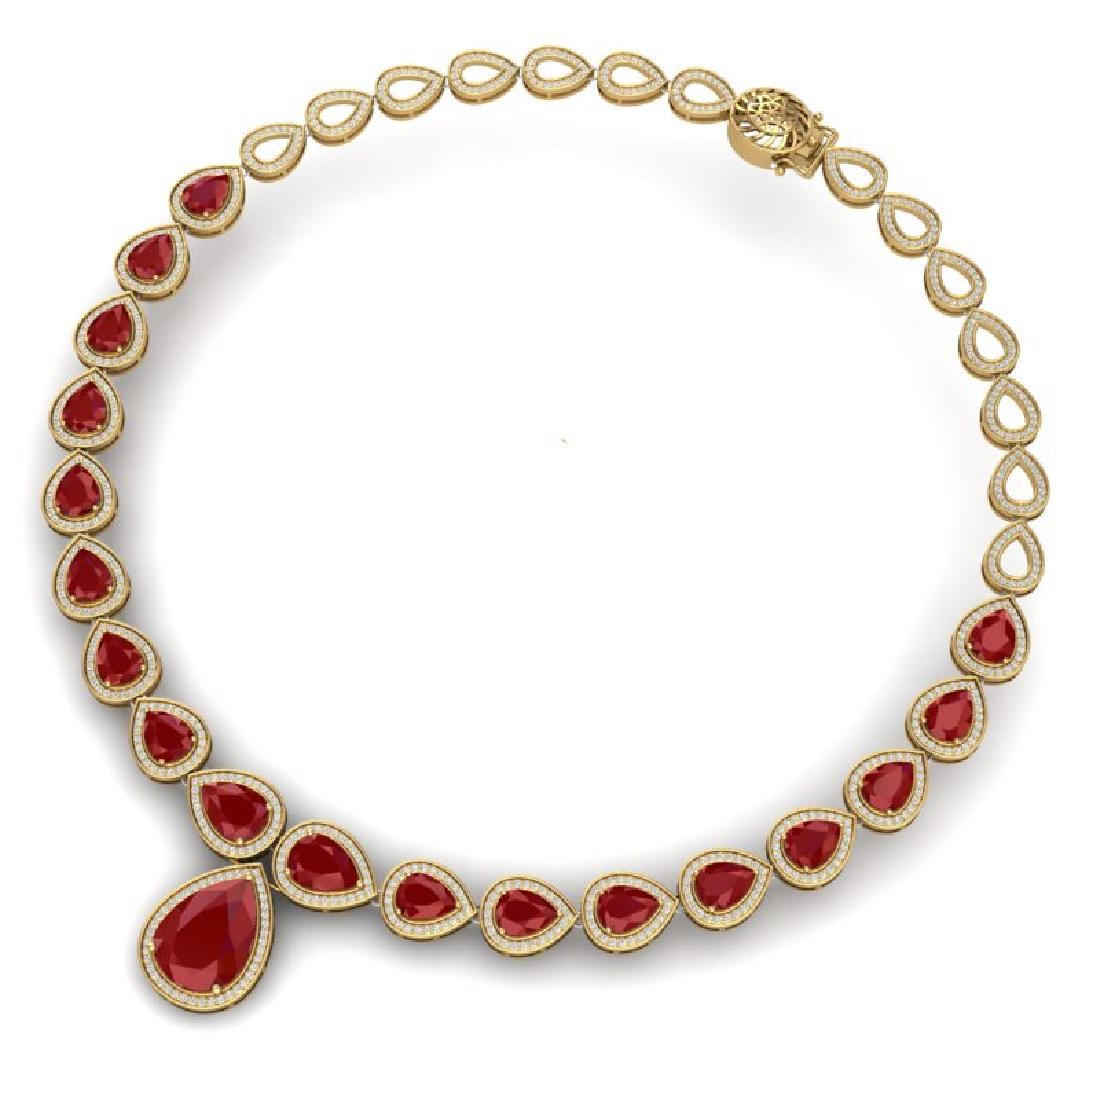 51.41 CTW Royalty Ruby & VS Diamond Necklace 18K Yellow - 3